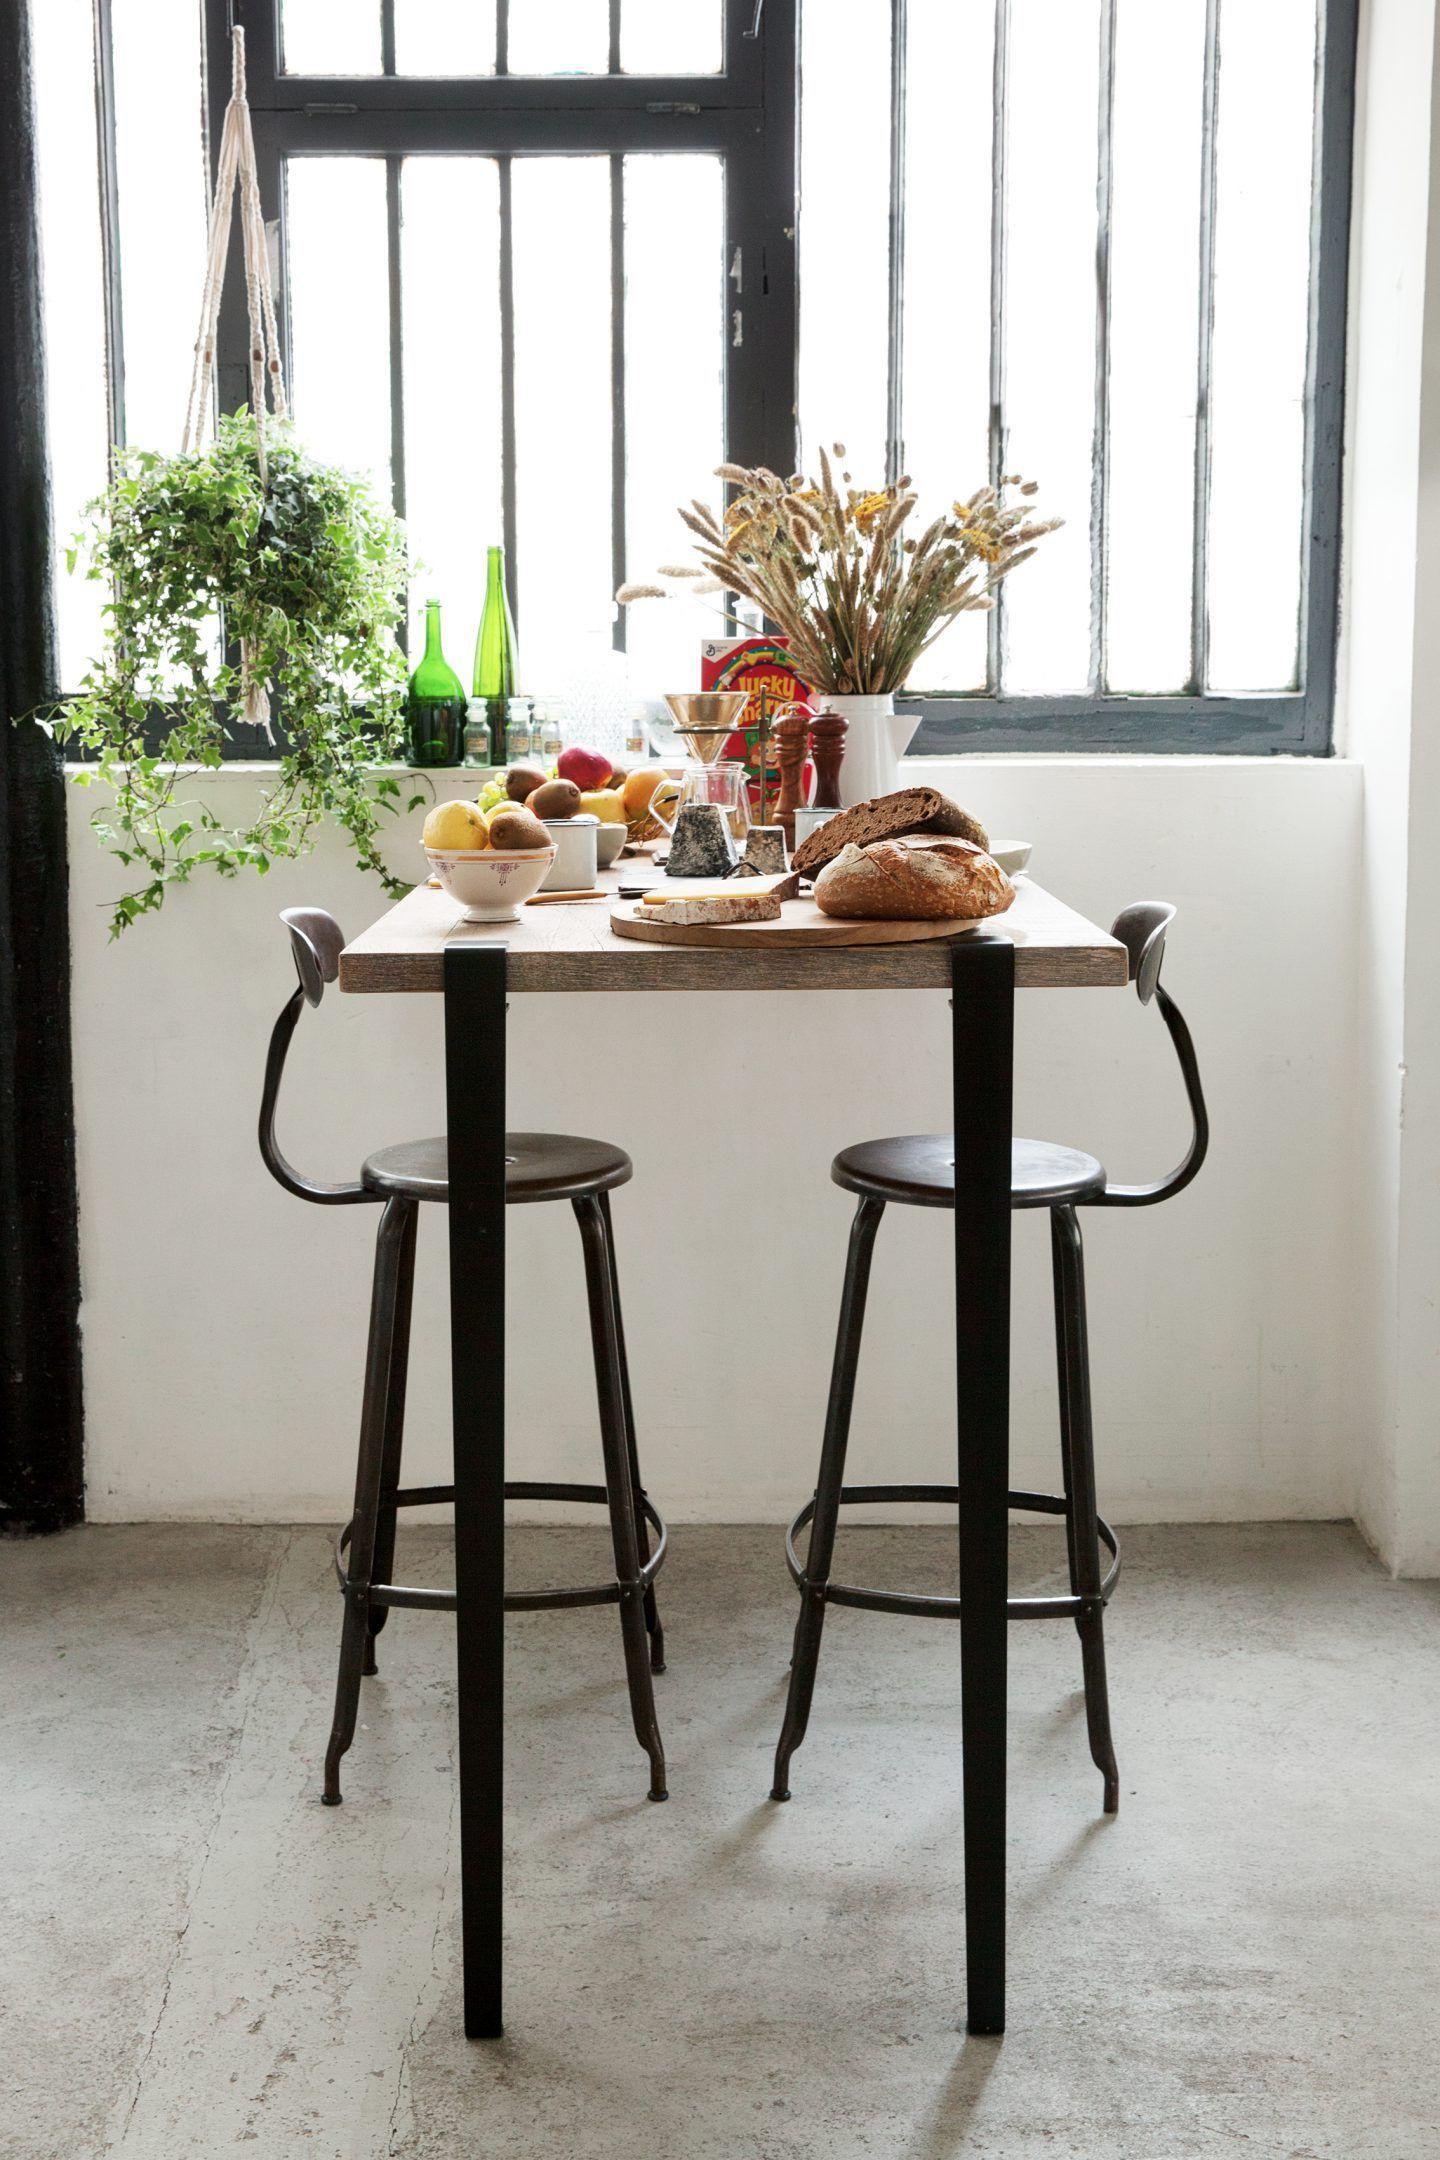 Bar Table Leg 110cm And Wall Bracket Pieds De Table Mange